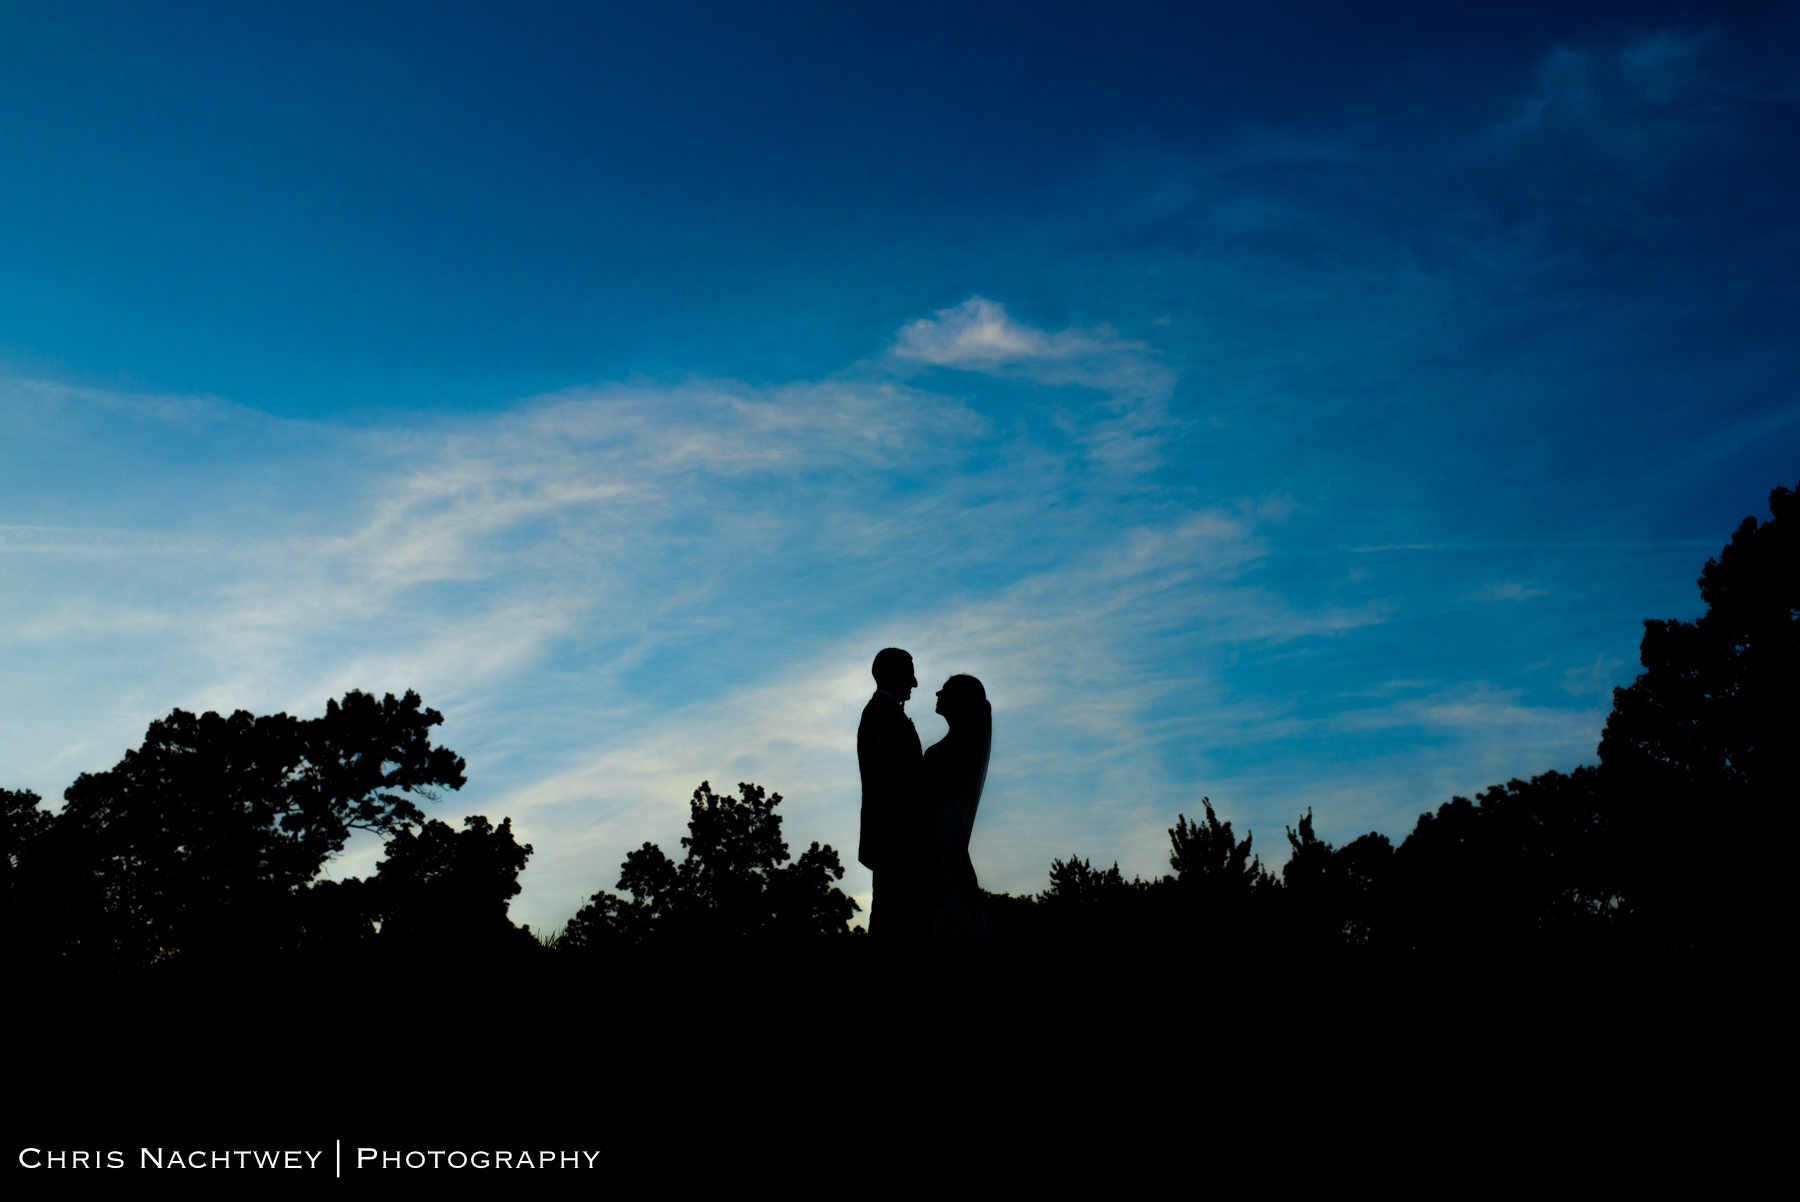 wedding-lake-of-isles-photos-chris-nachtwey-photography-2019-45.jpg